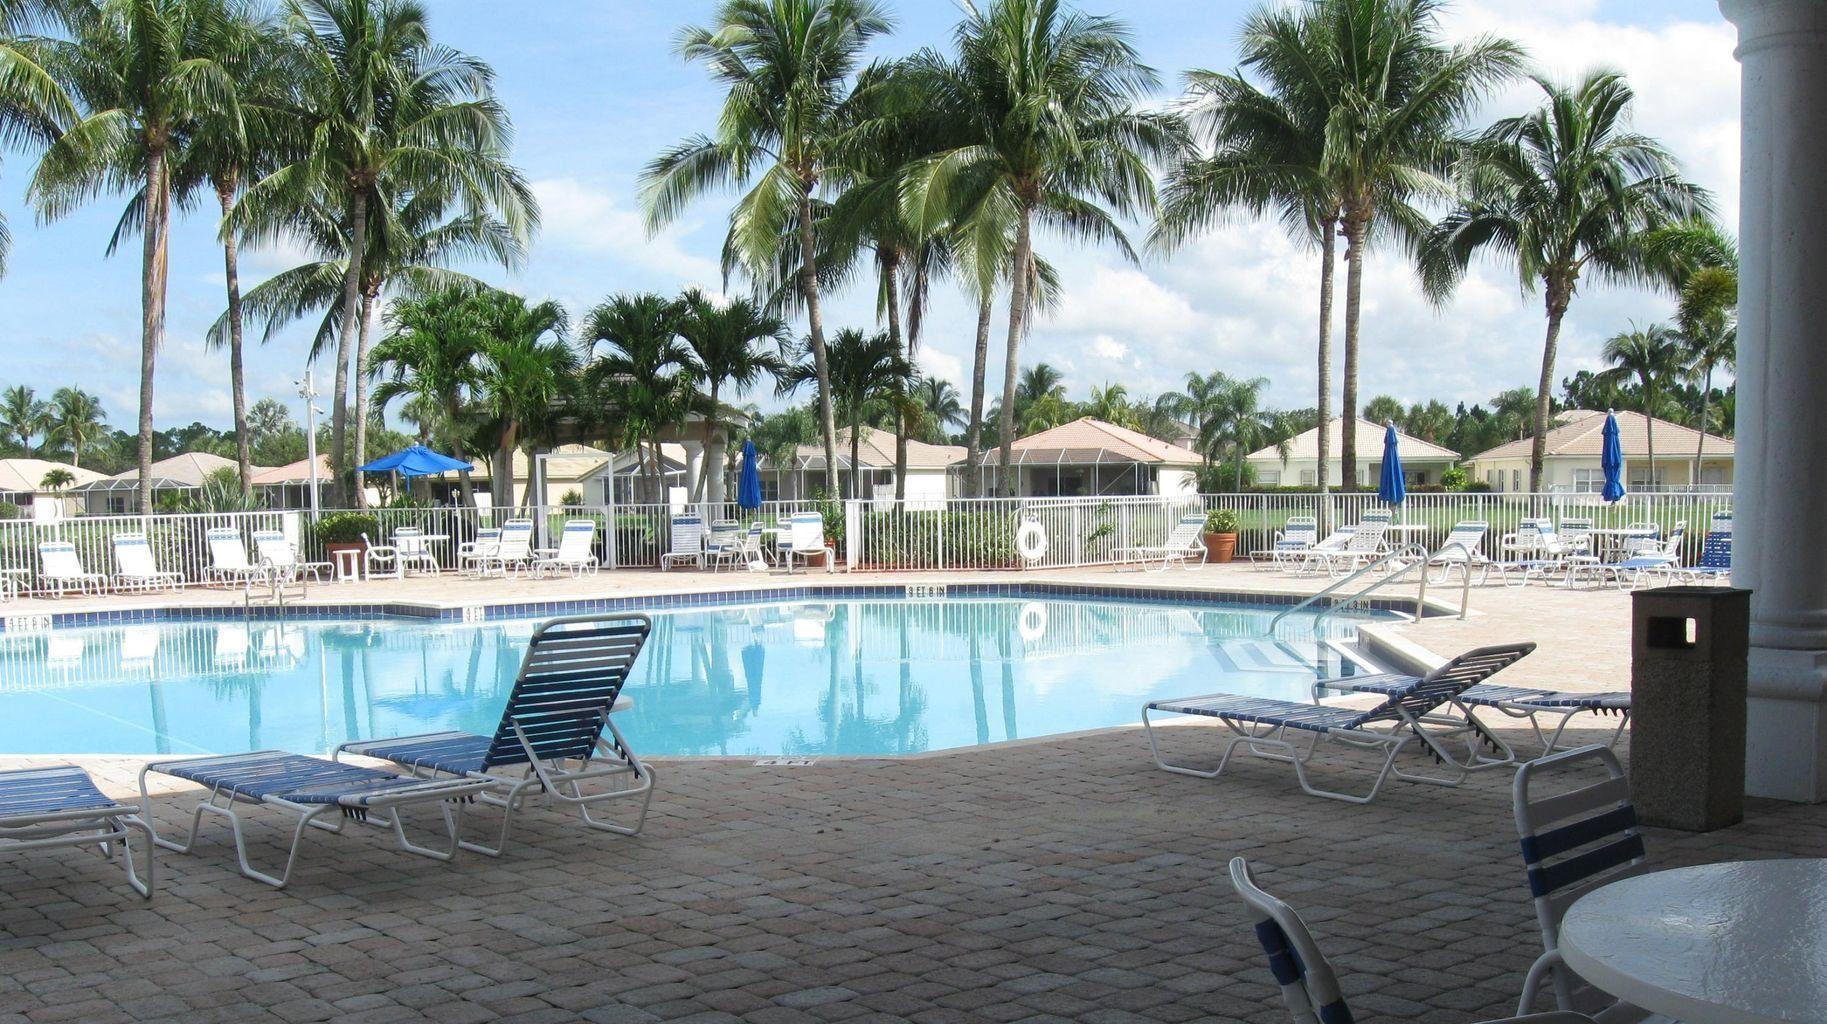 2198 Man Of War, West Palm Beach, FL 33411 - MLS#: RX-10716599